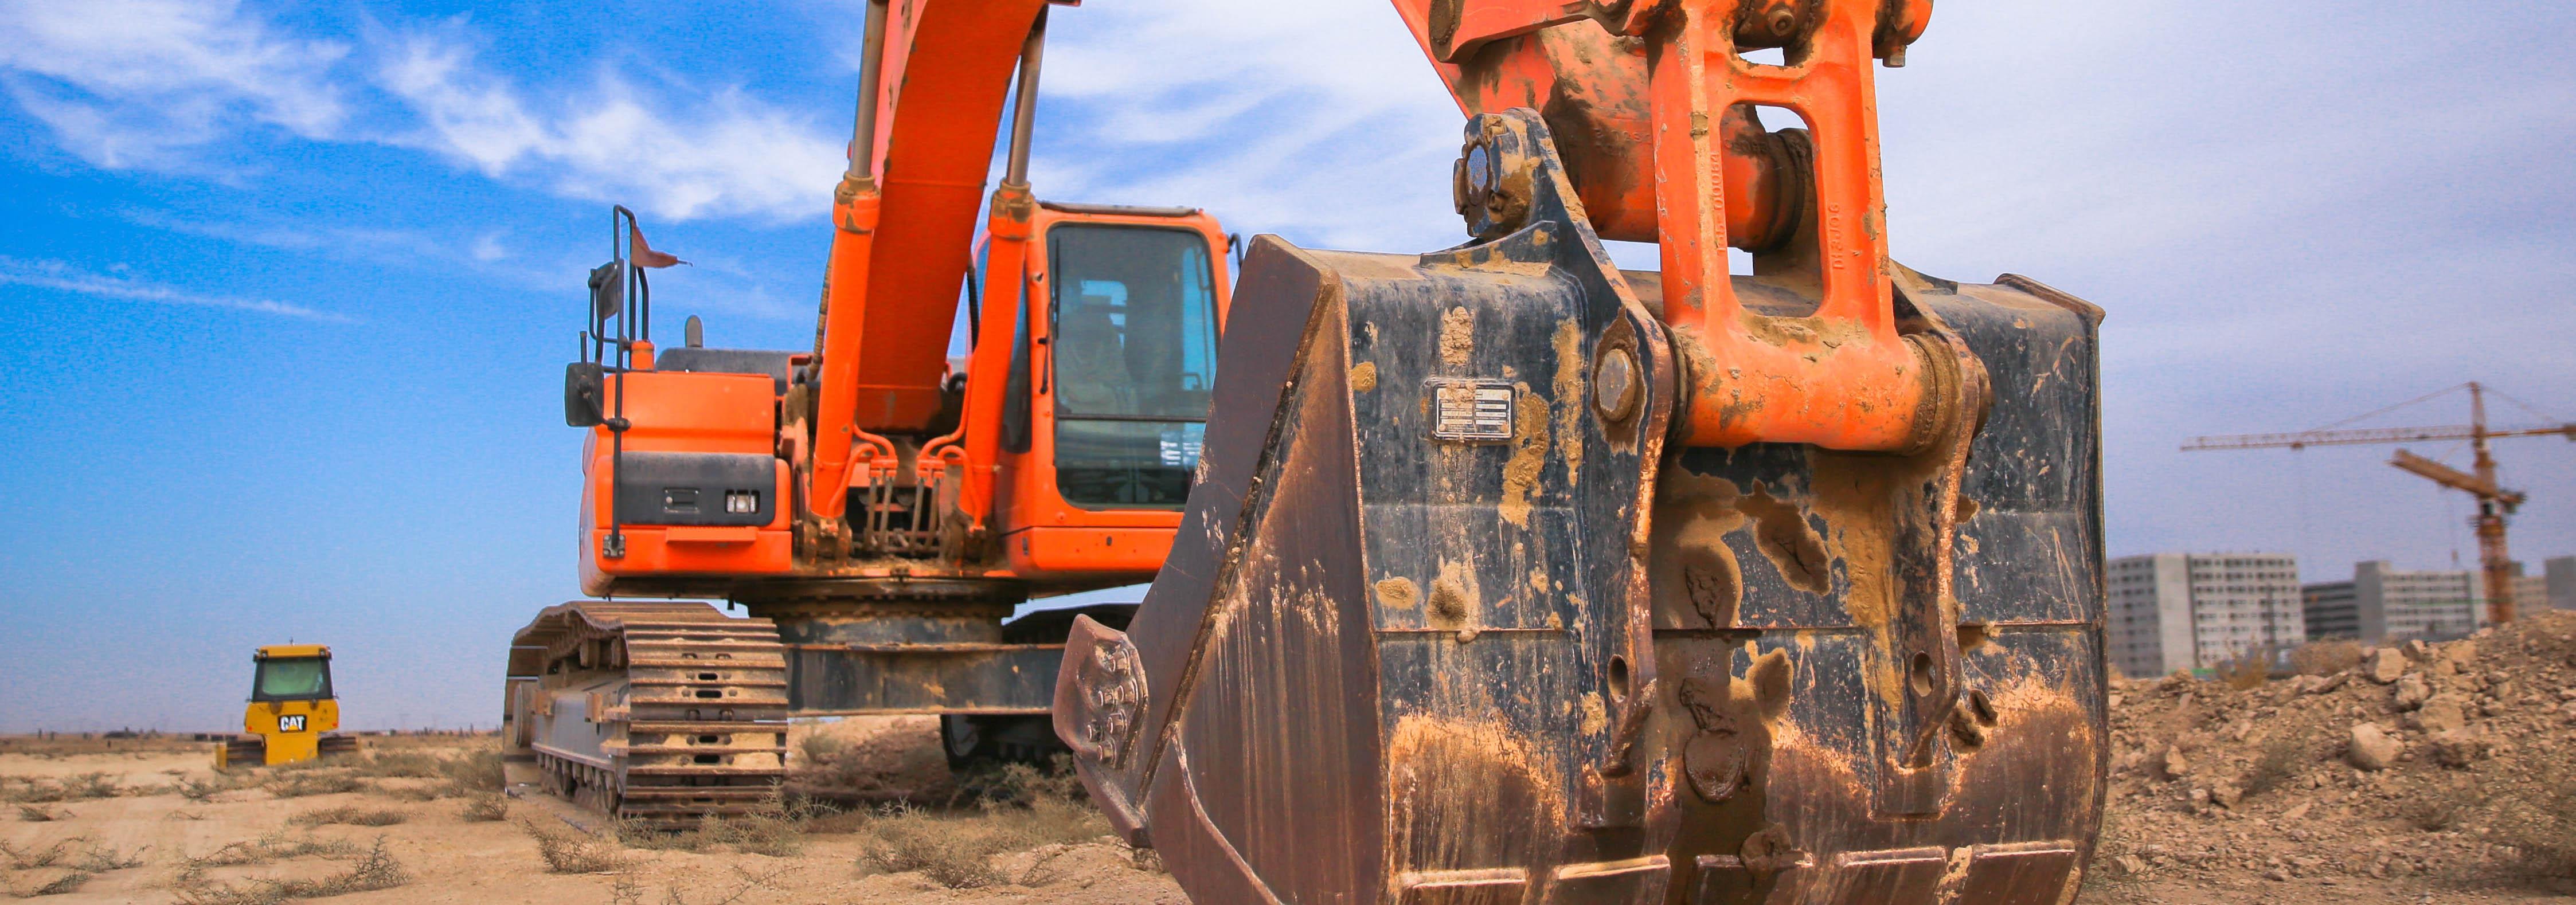 Construction Equipment Expertise